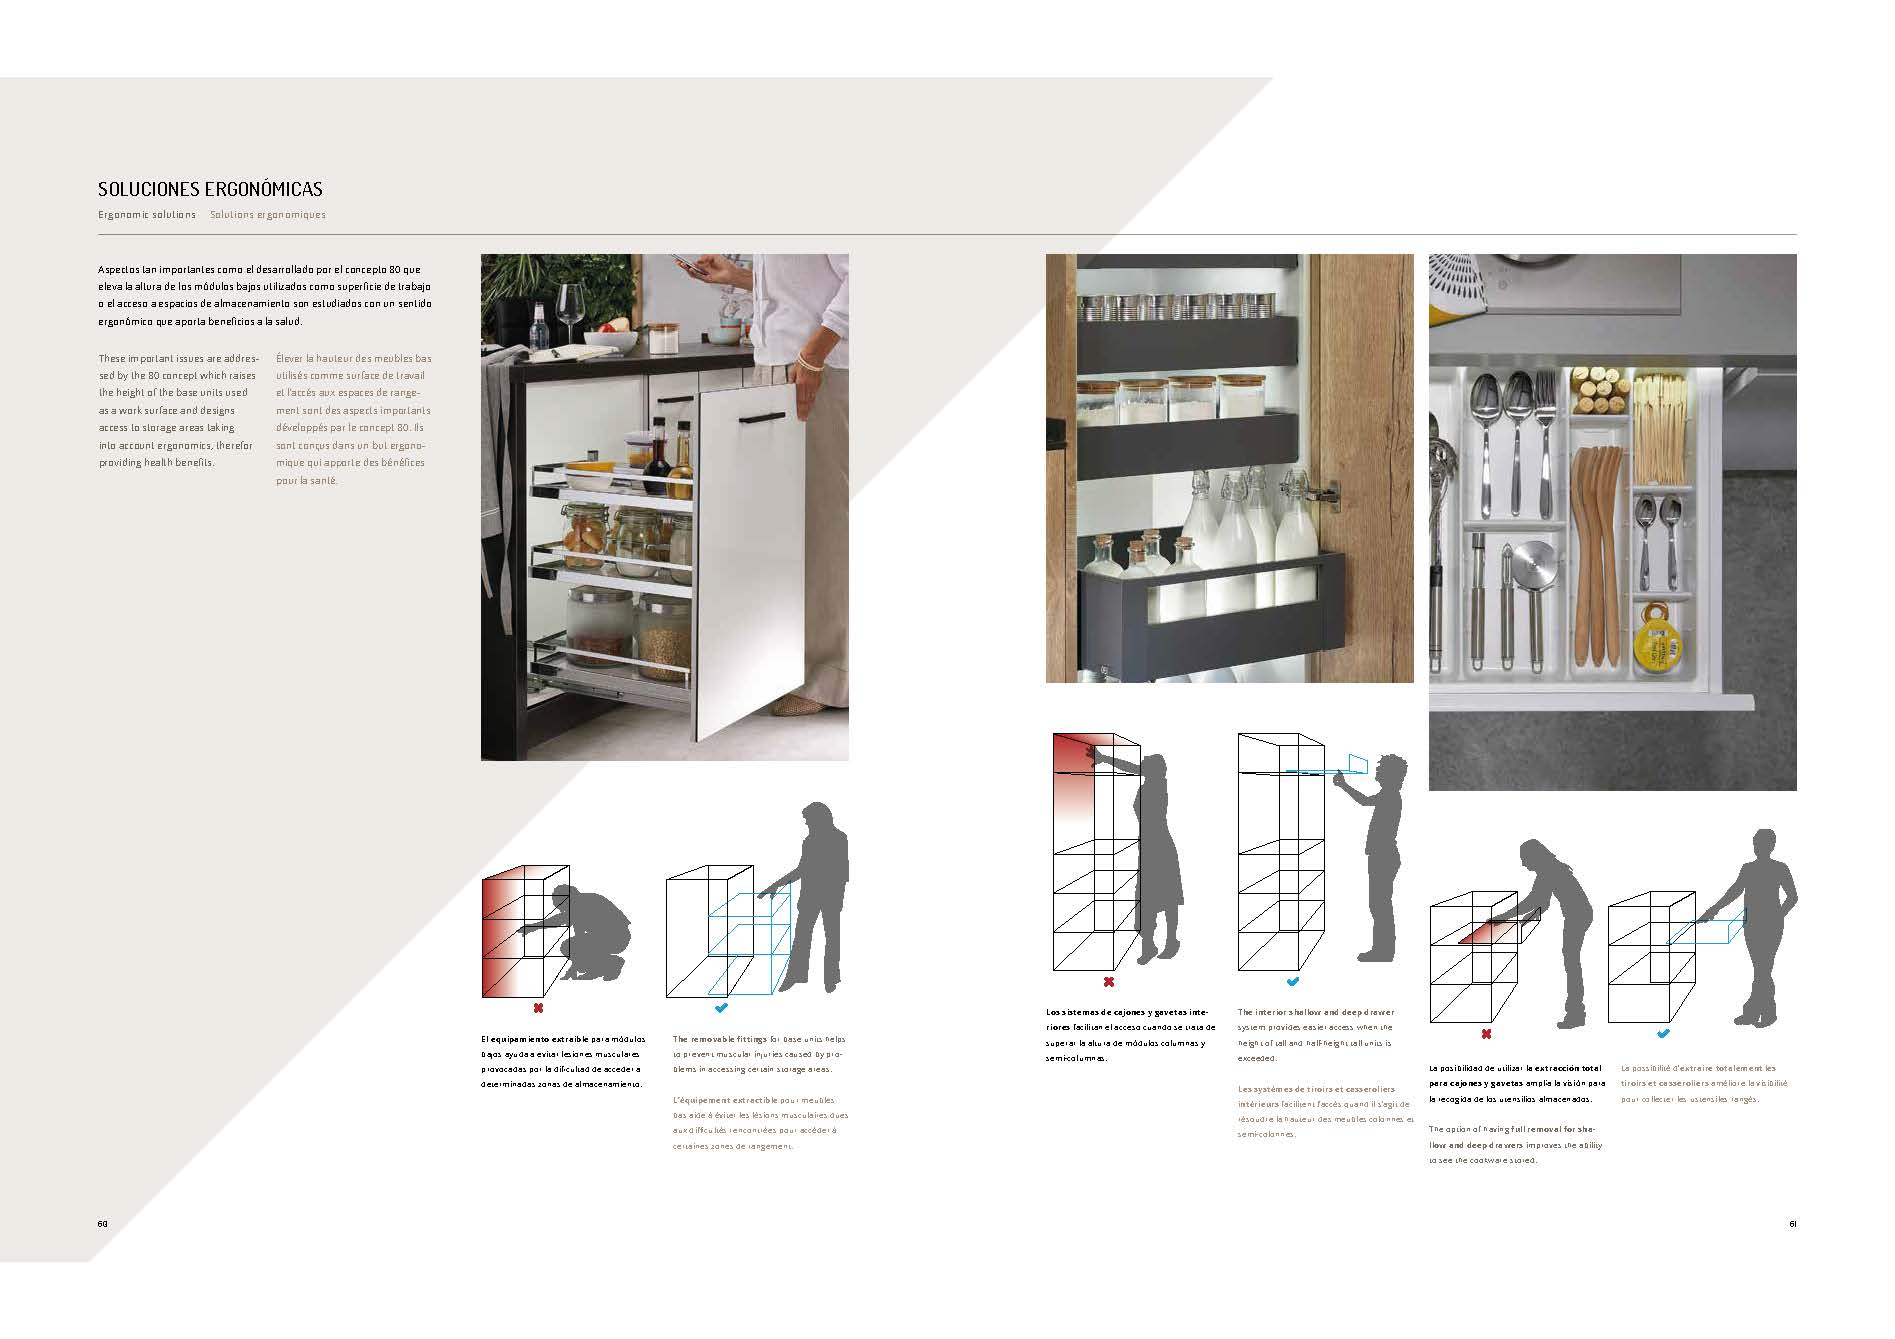 Ficha técnica soluciones ergonómicas de cocina